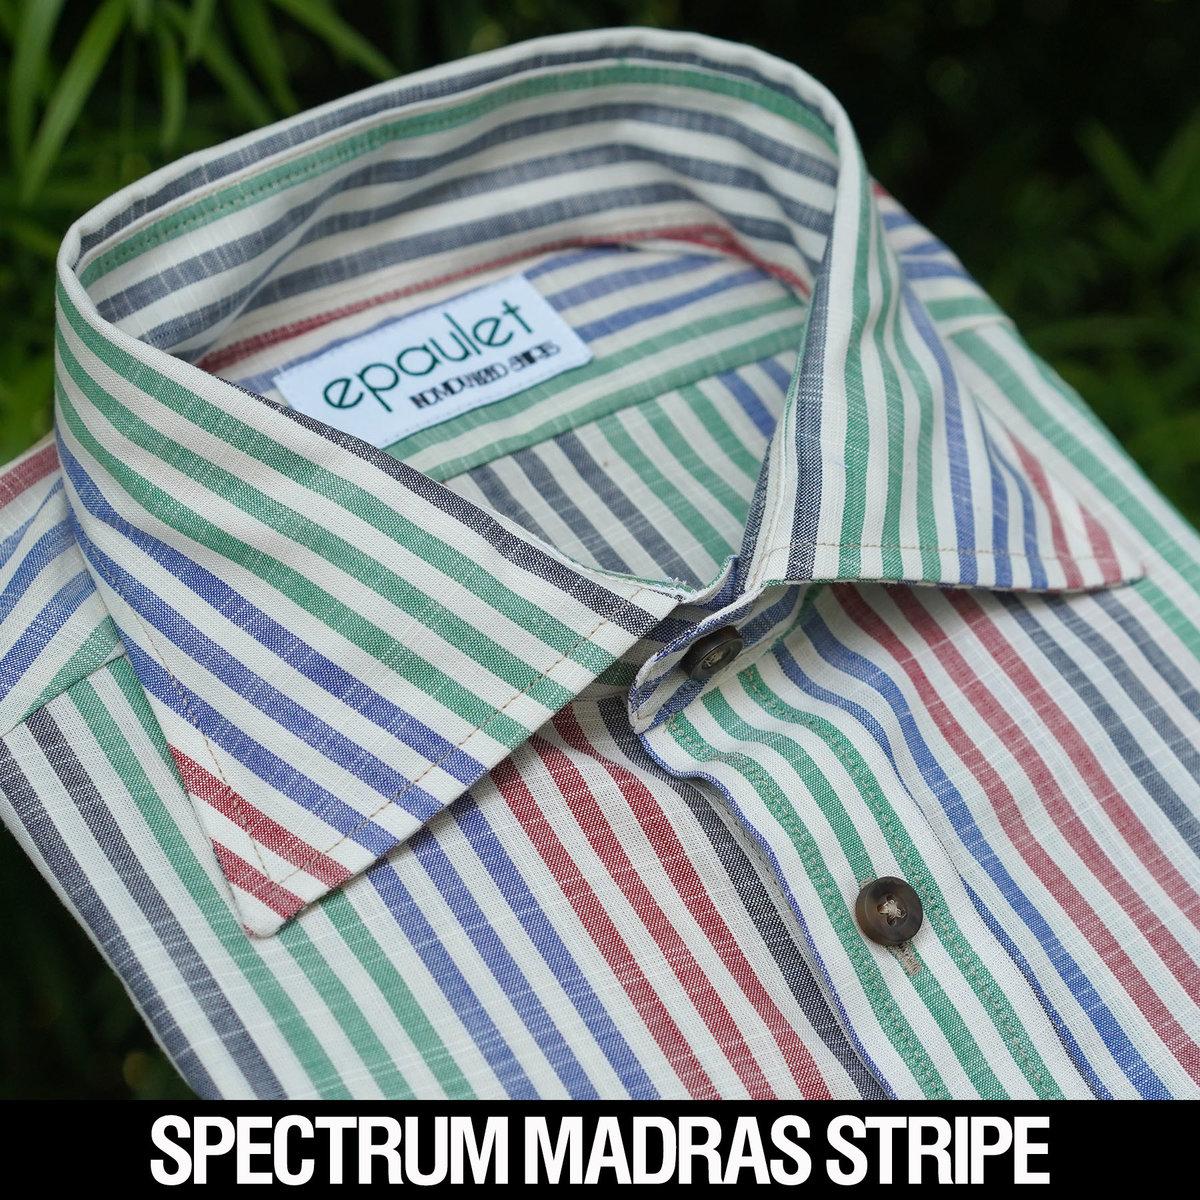 Spectrum Madras Stripe.jpg